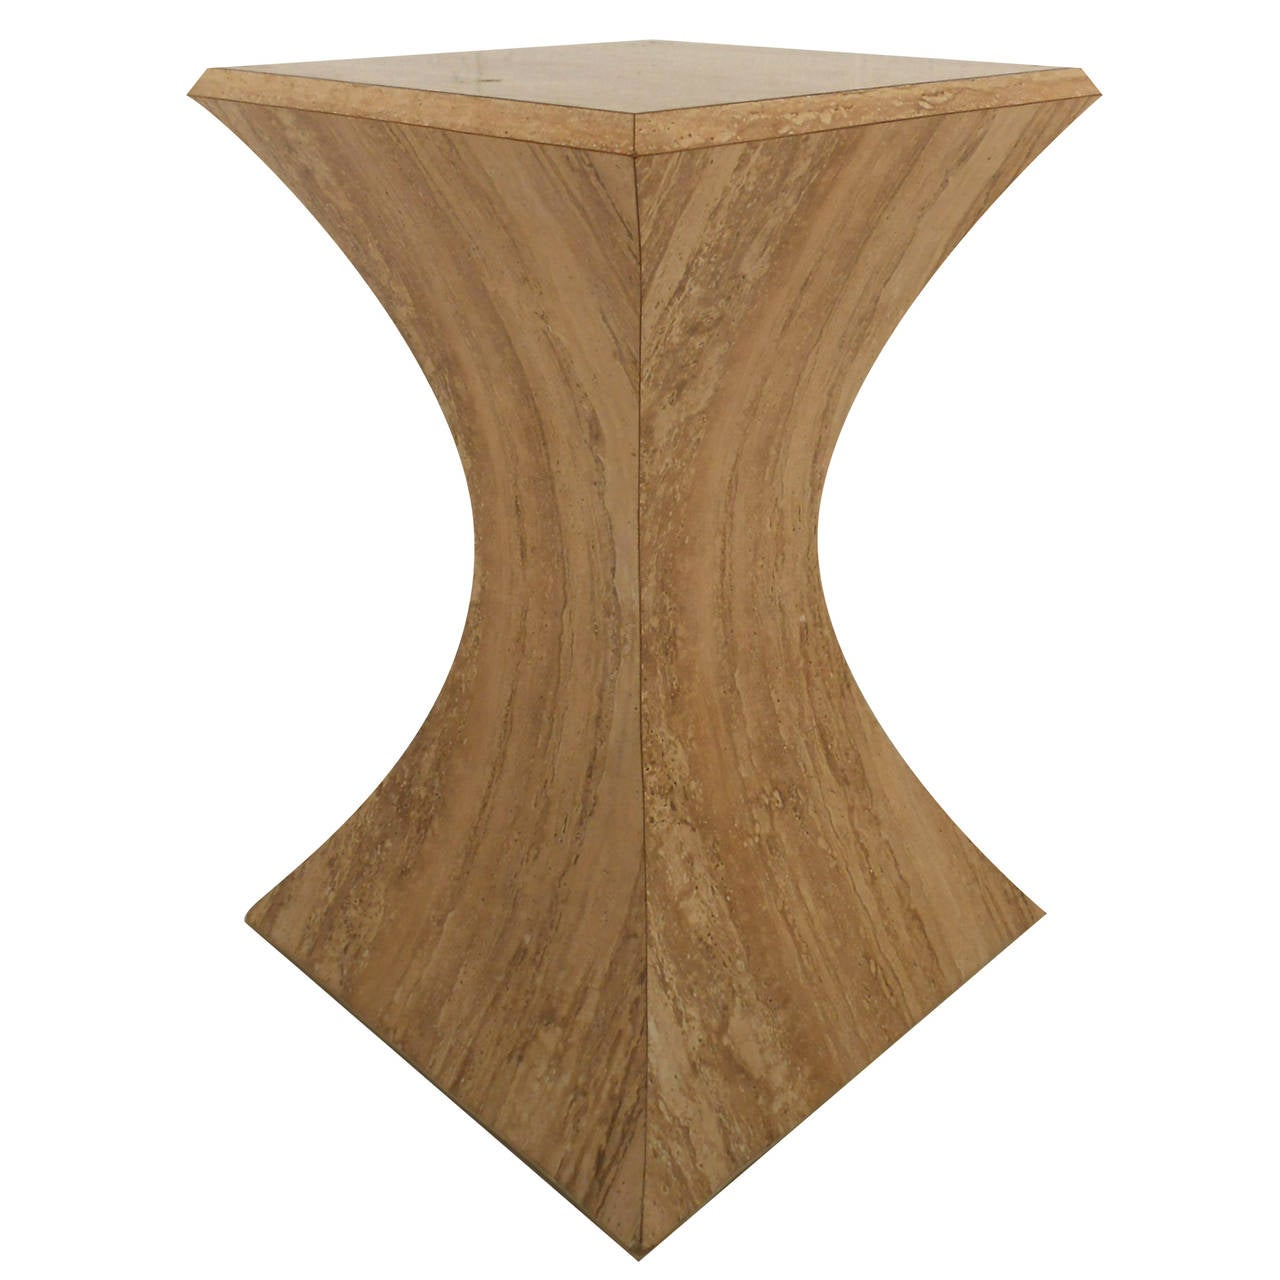 Mid-Century Modern Faux Stone Pedestal Table